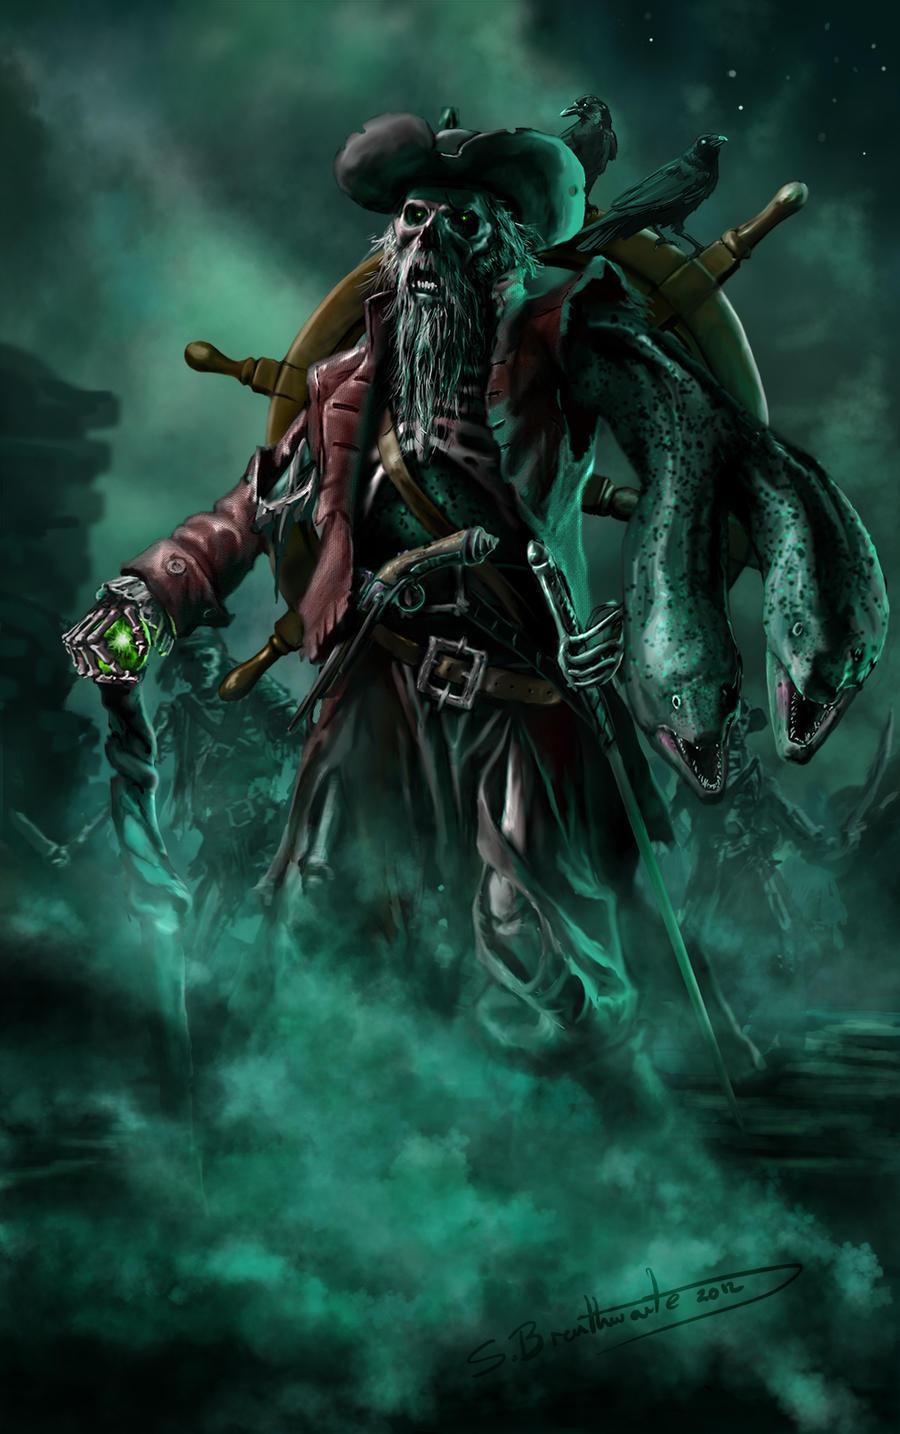 Pirate King by SBraithwaite